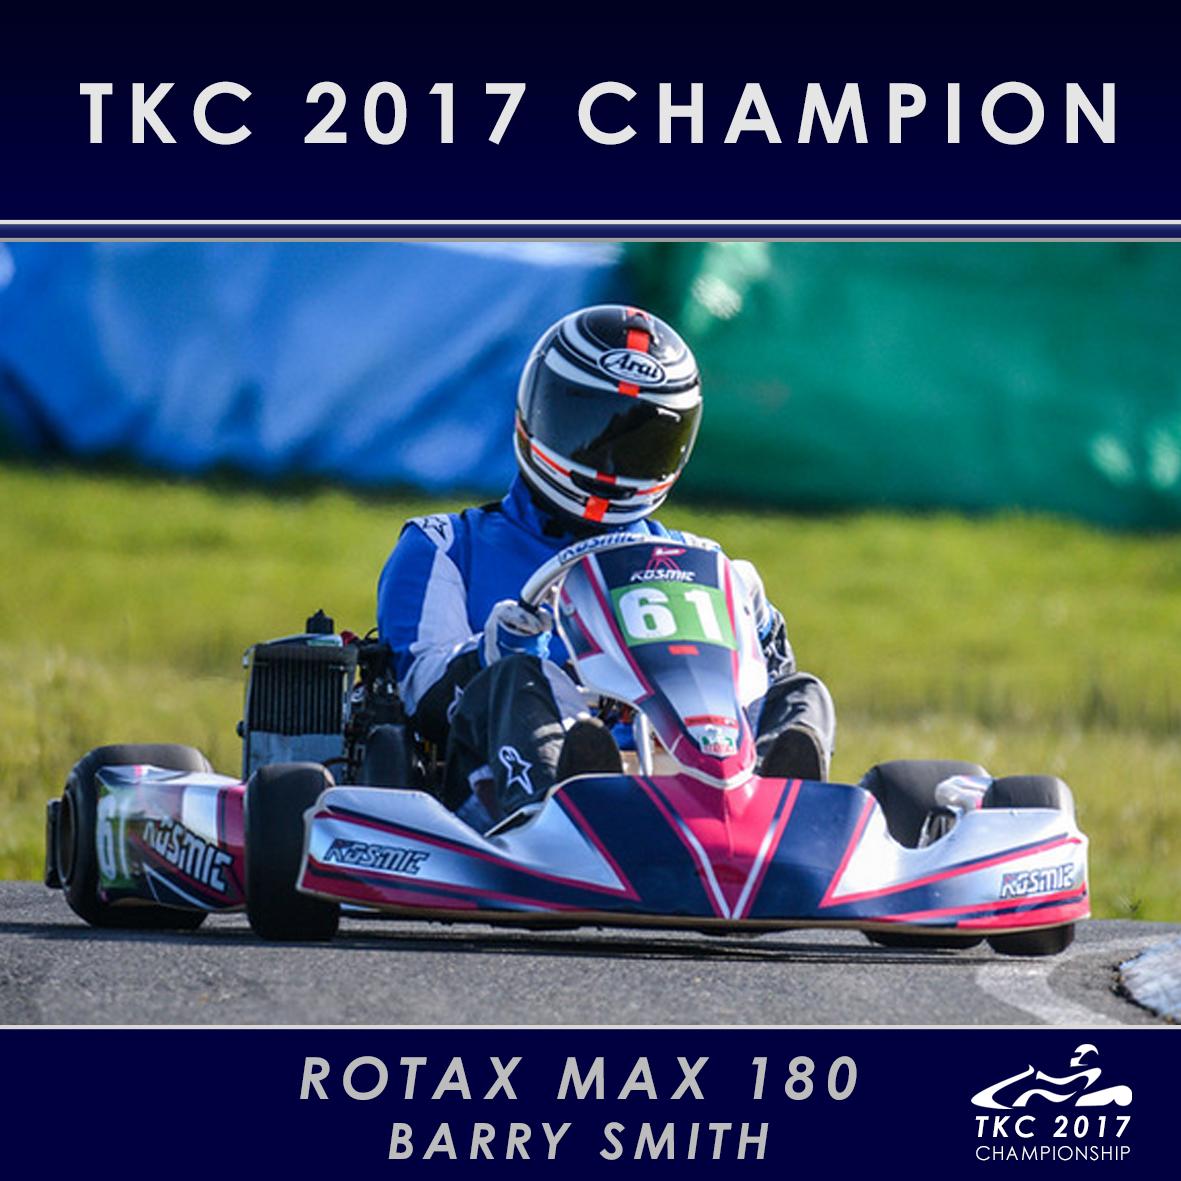 Rotax 180 - Barry Smith